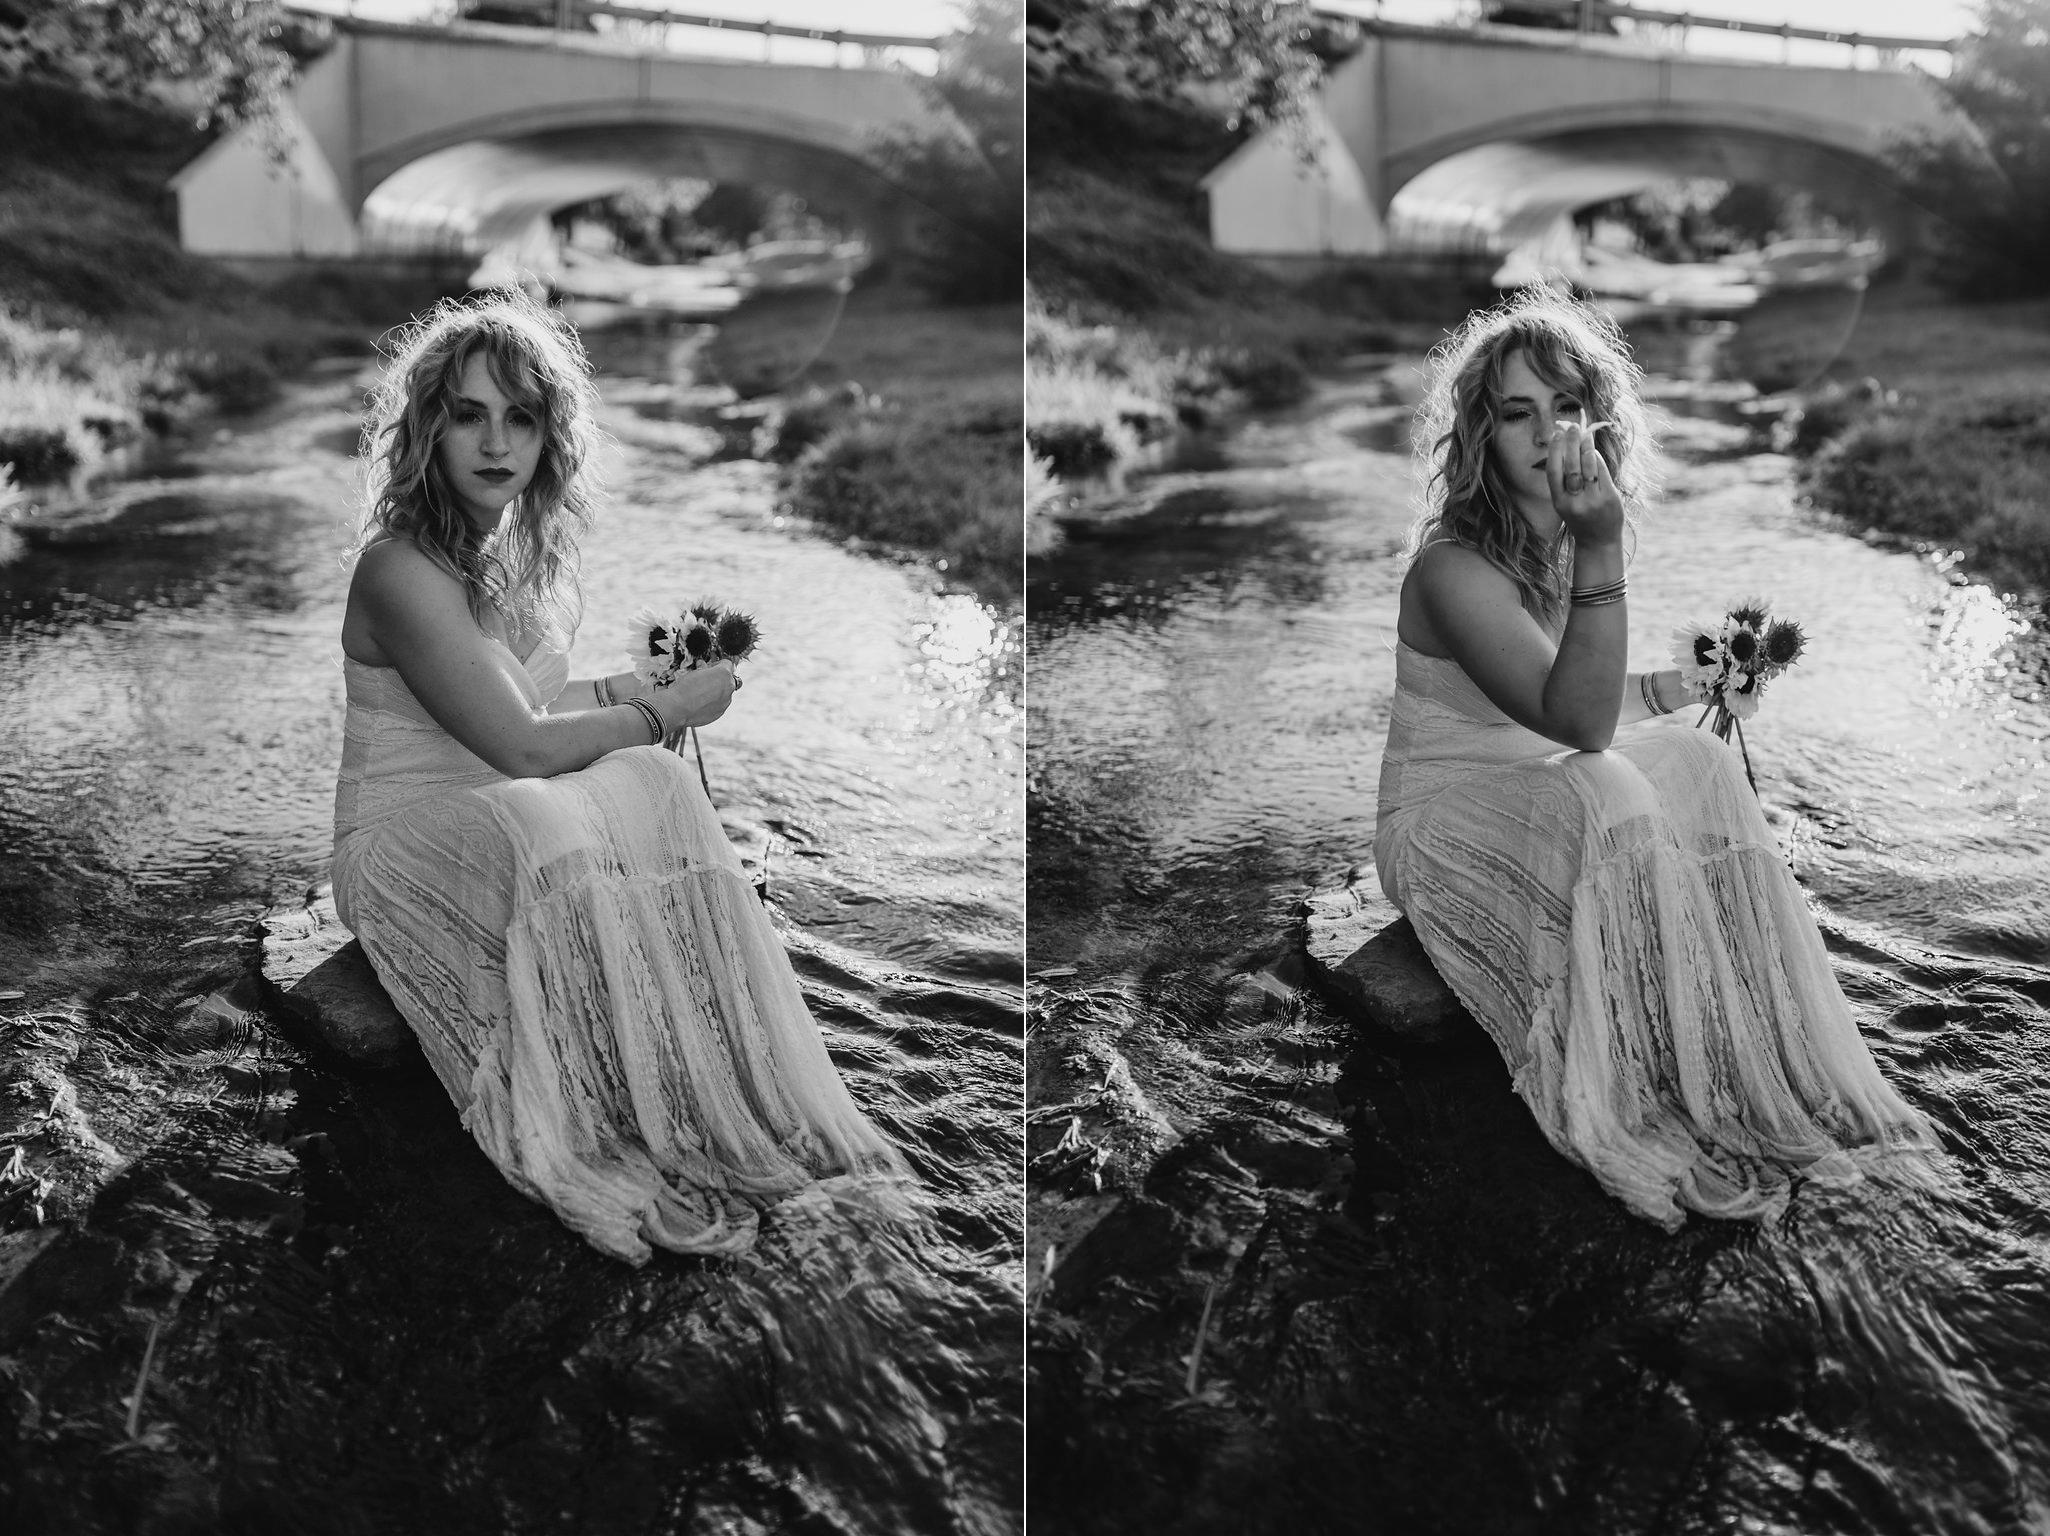 Camille-Joy-Music-Franklin-Tennessee-Photographer-Creek-Berry-Farms-Senior-Portraits-Water-17